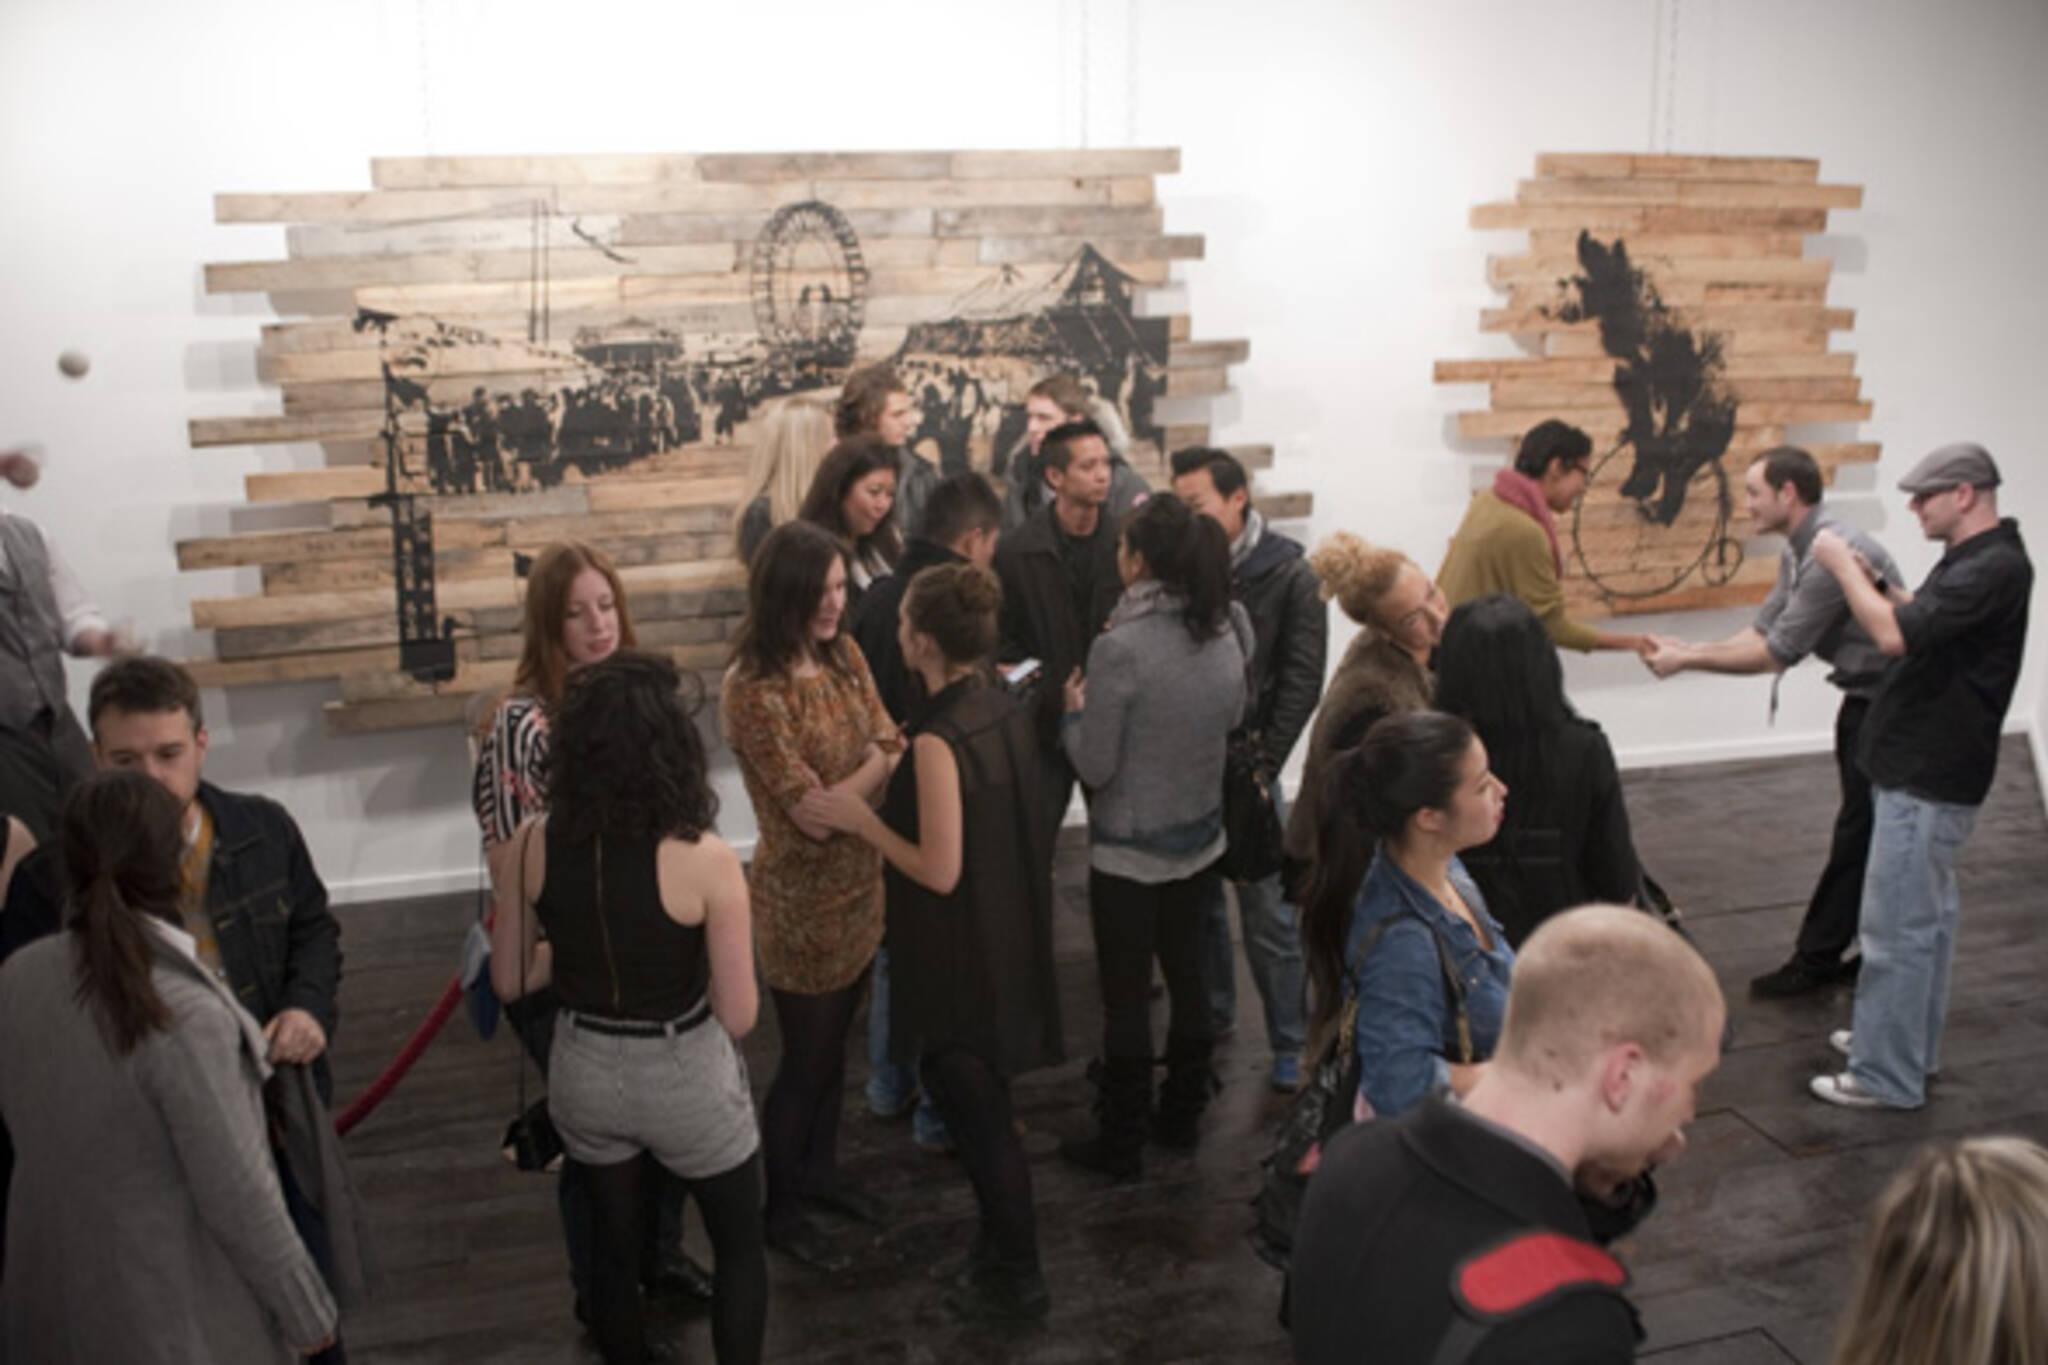 Goodfellas Gallery